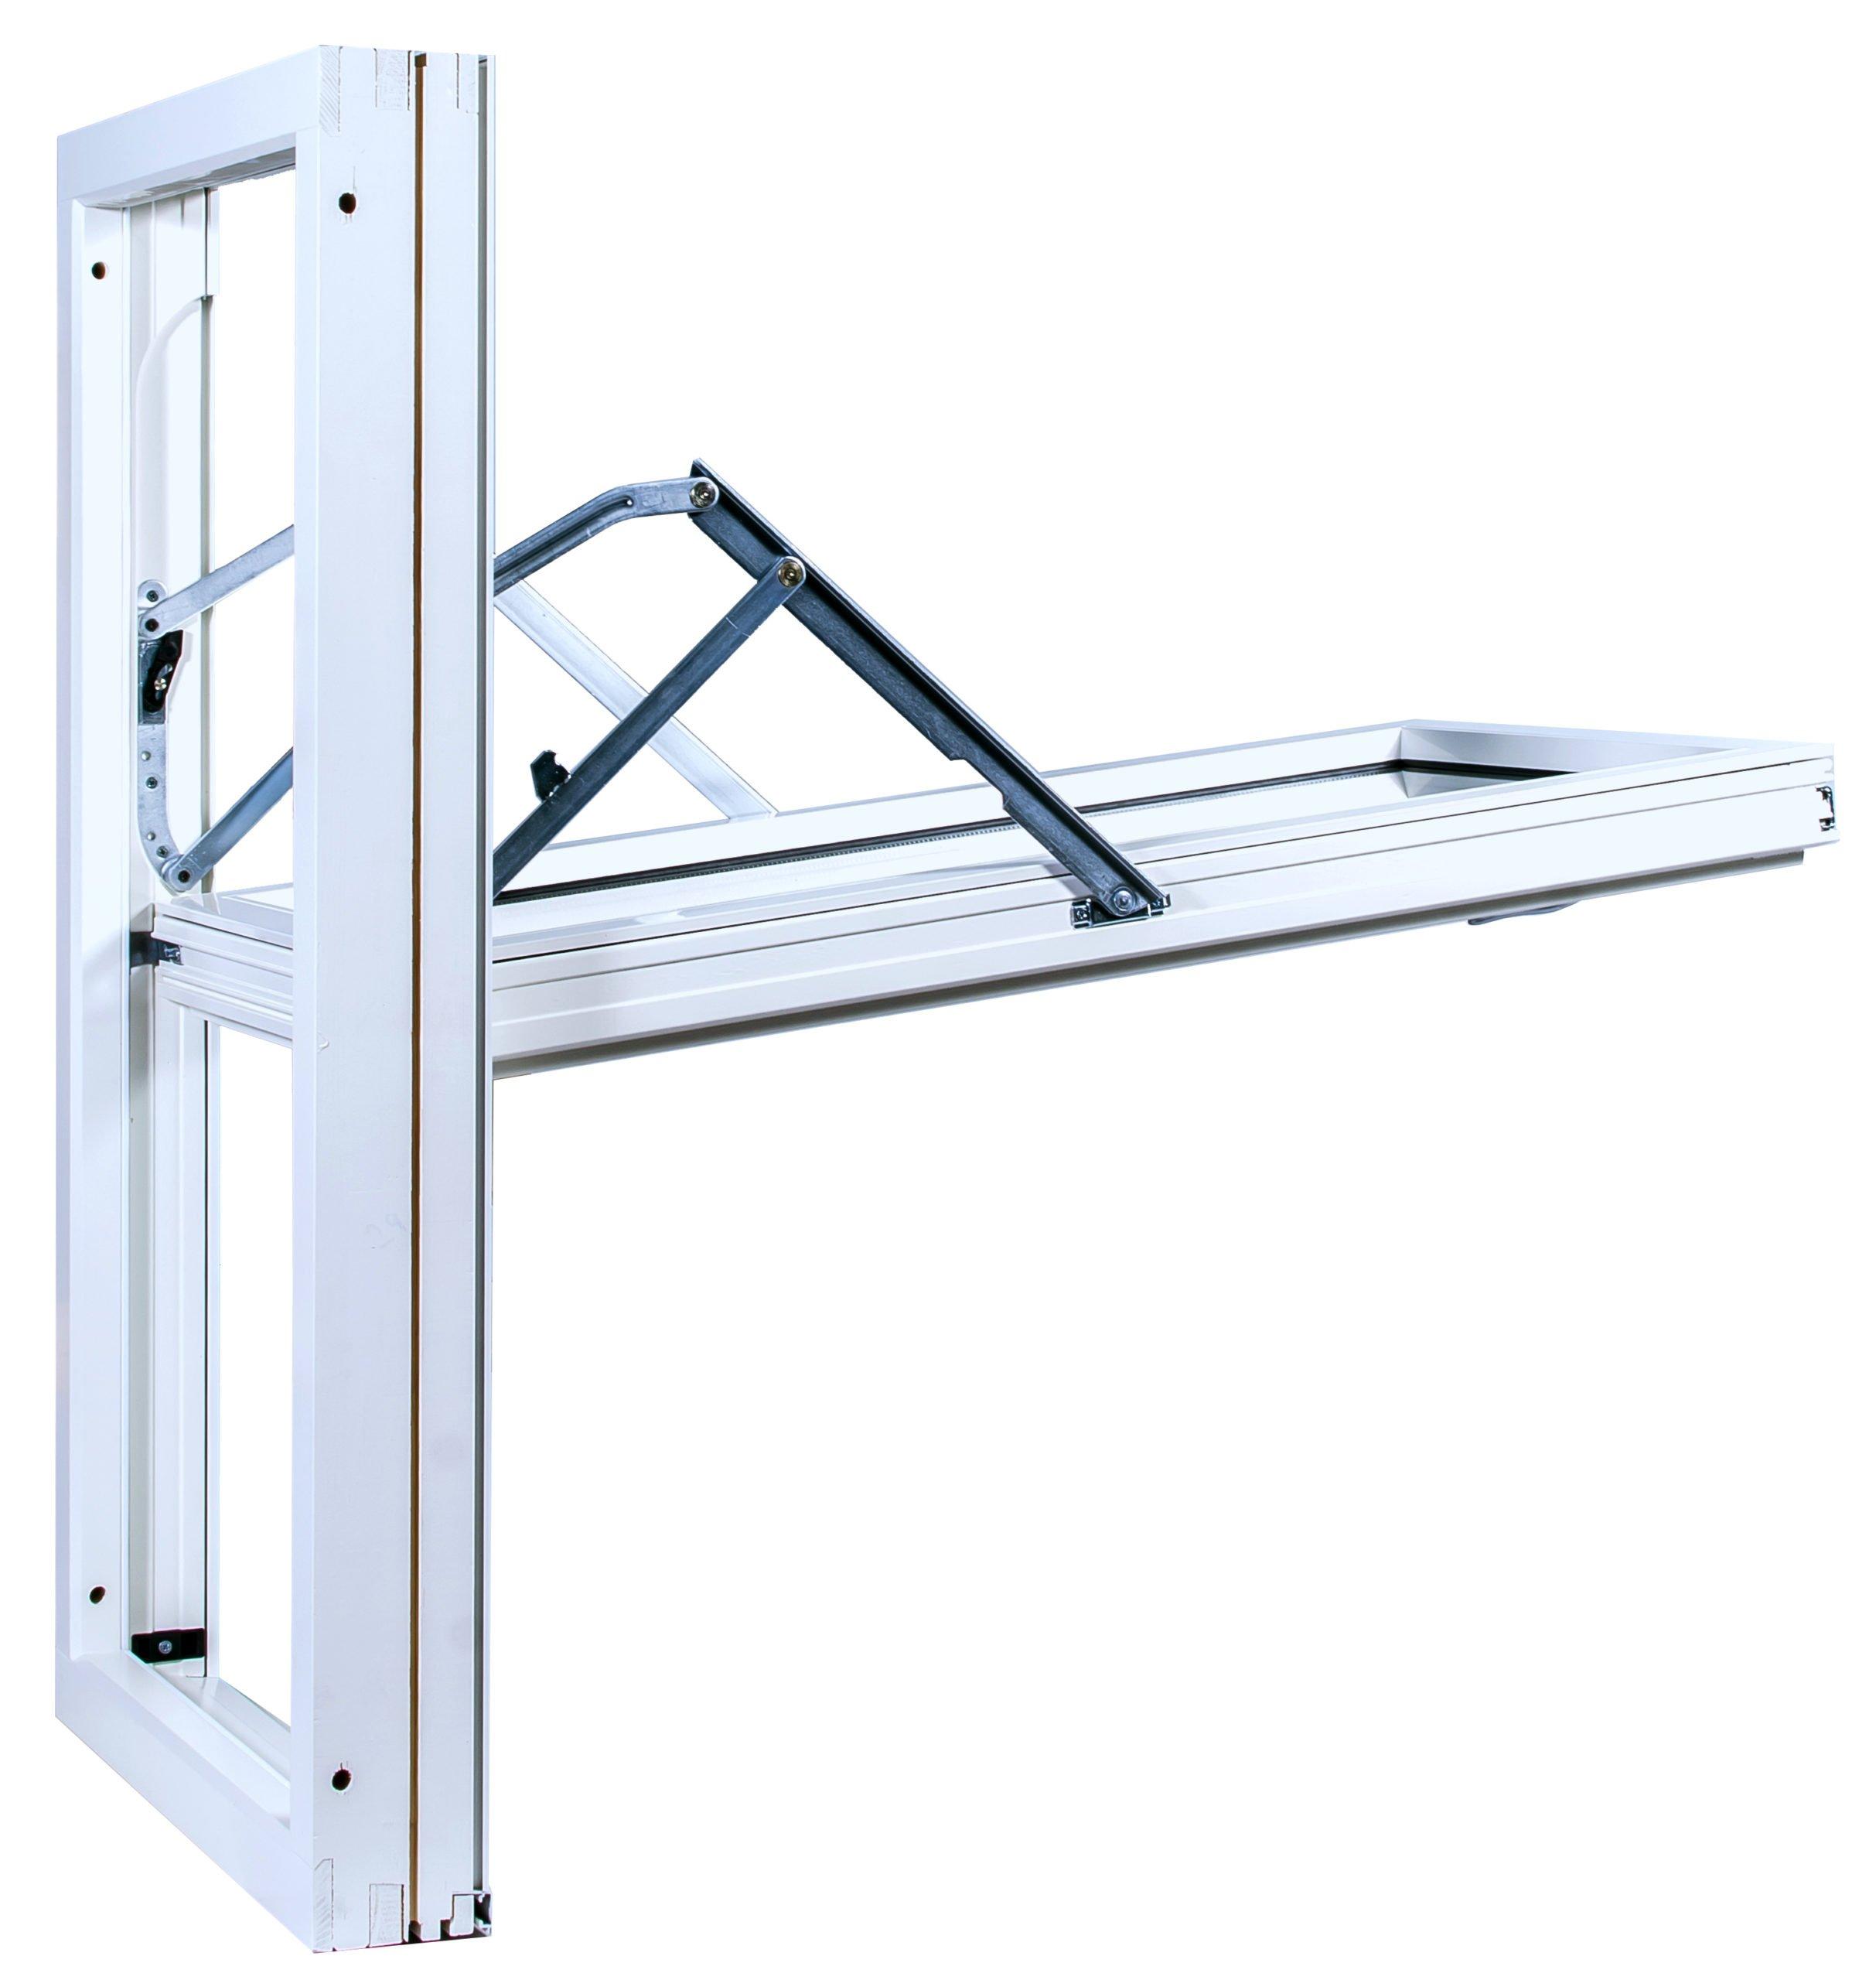 byta fönster fönsterbyte